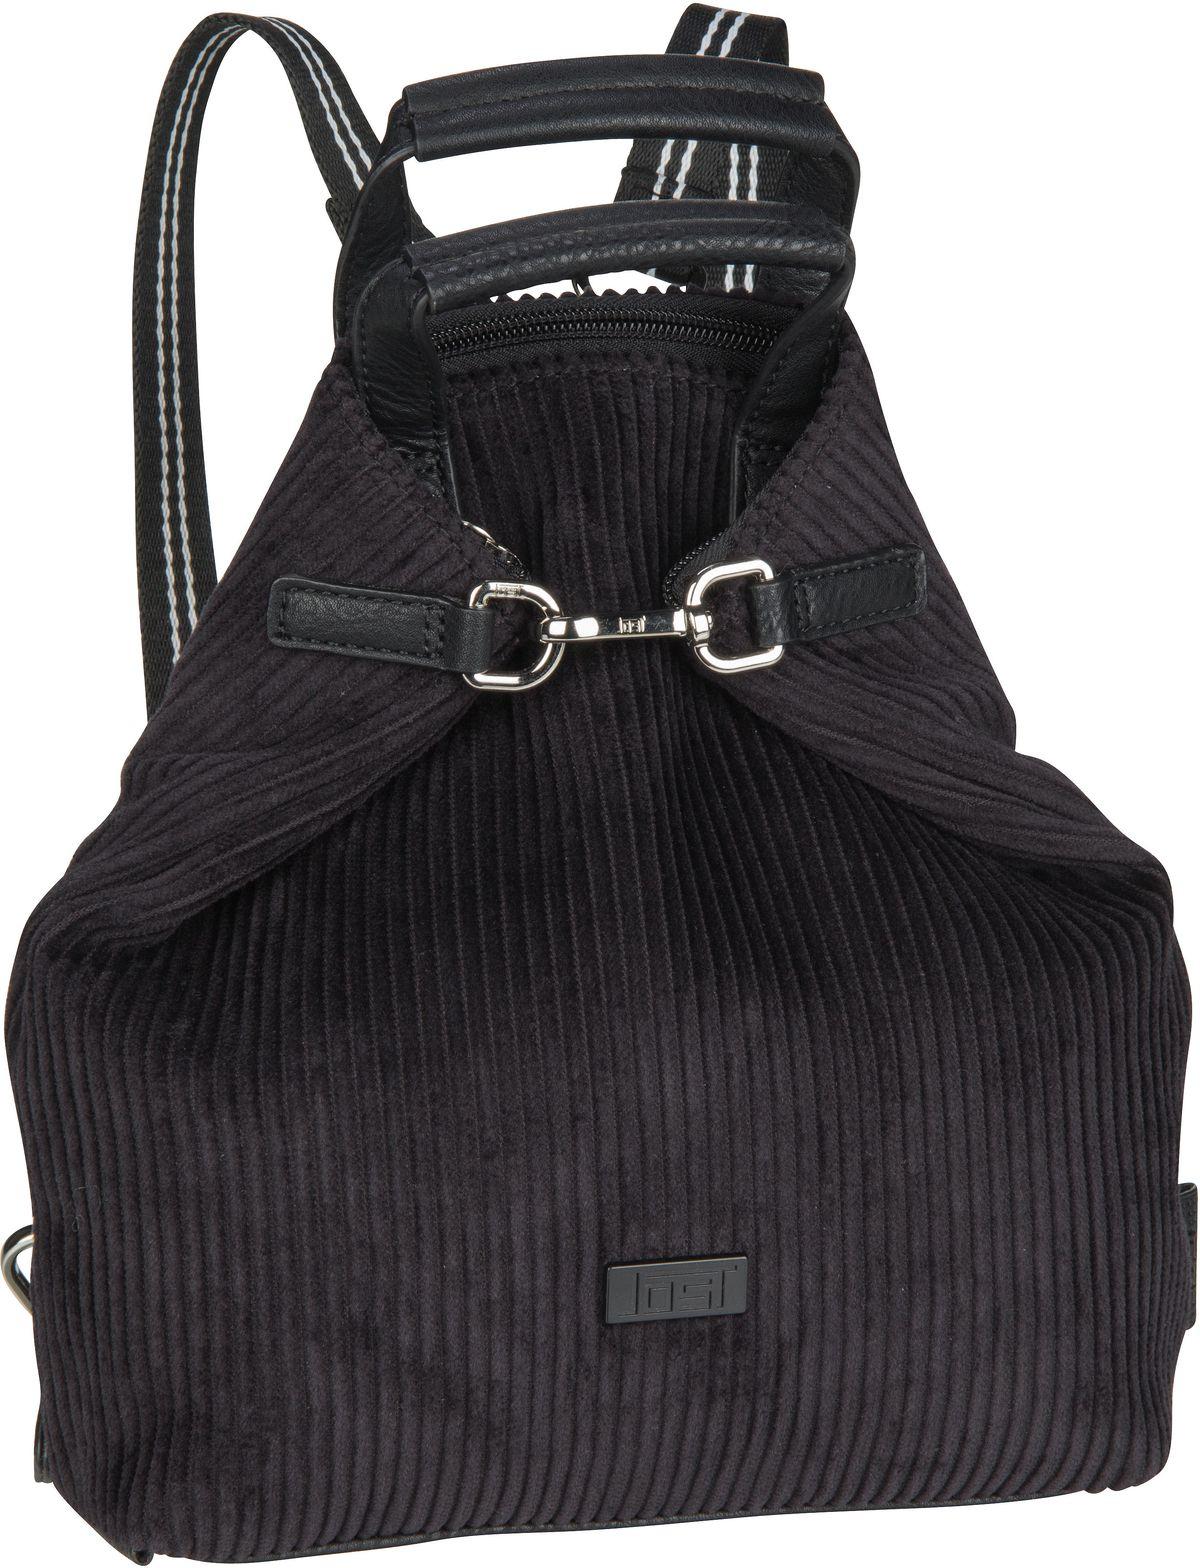 Rucksack / Daypack Cord 7943 X-Change Bag Mini Black